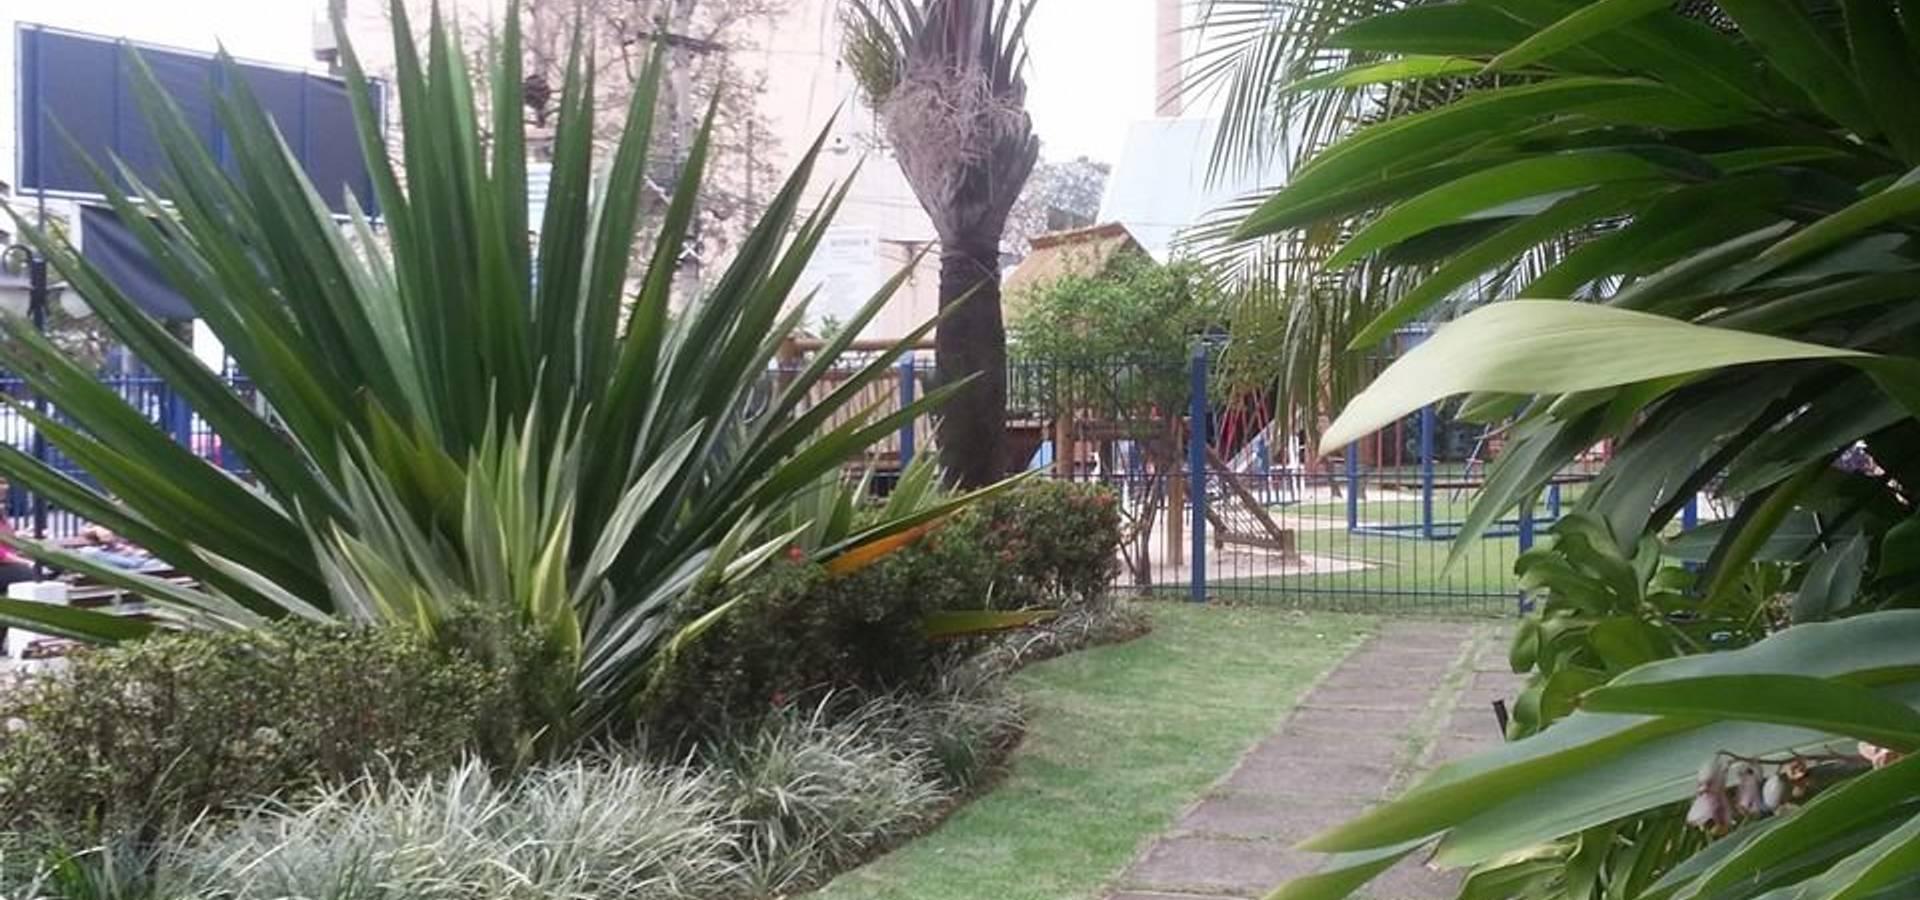 artverde- i.m.souza paisagismo ltda